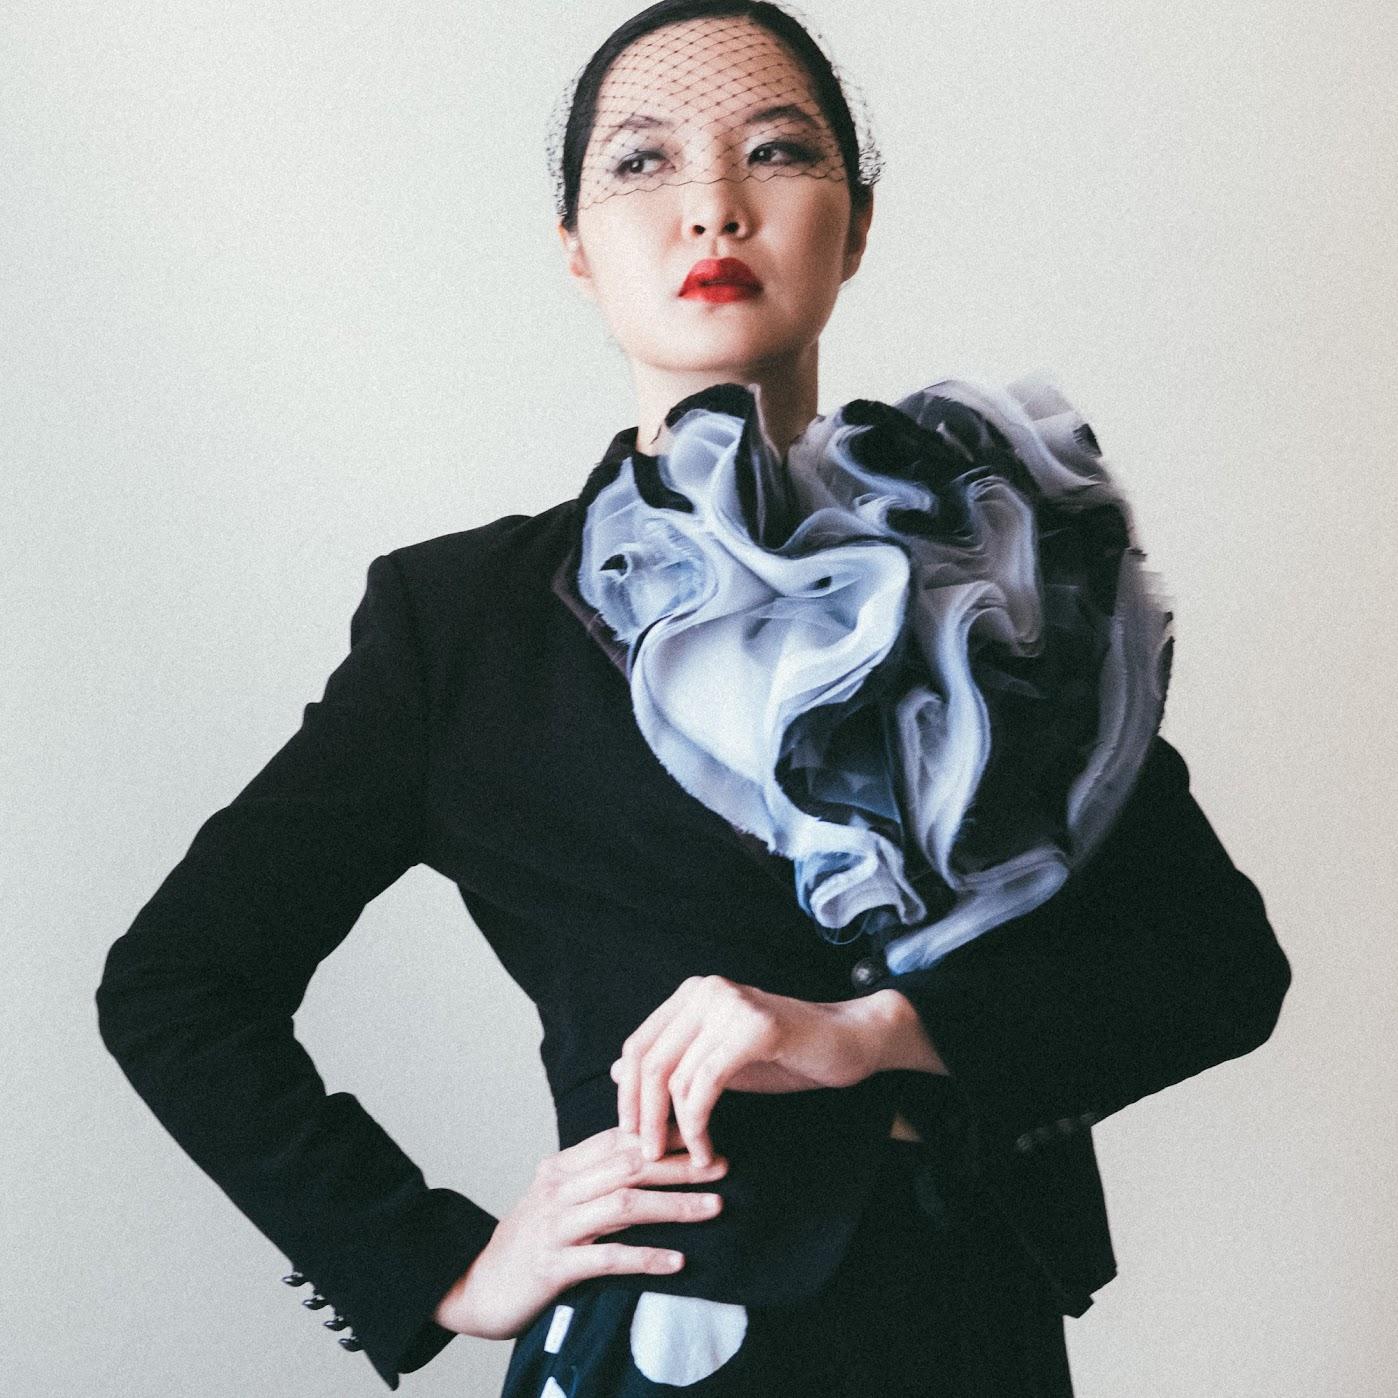 Black and White Organza Bloom Neckpiece - DIY Fashion project | fafafoom.com